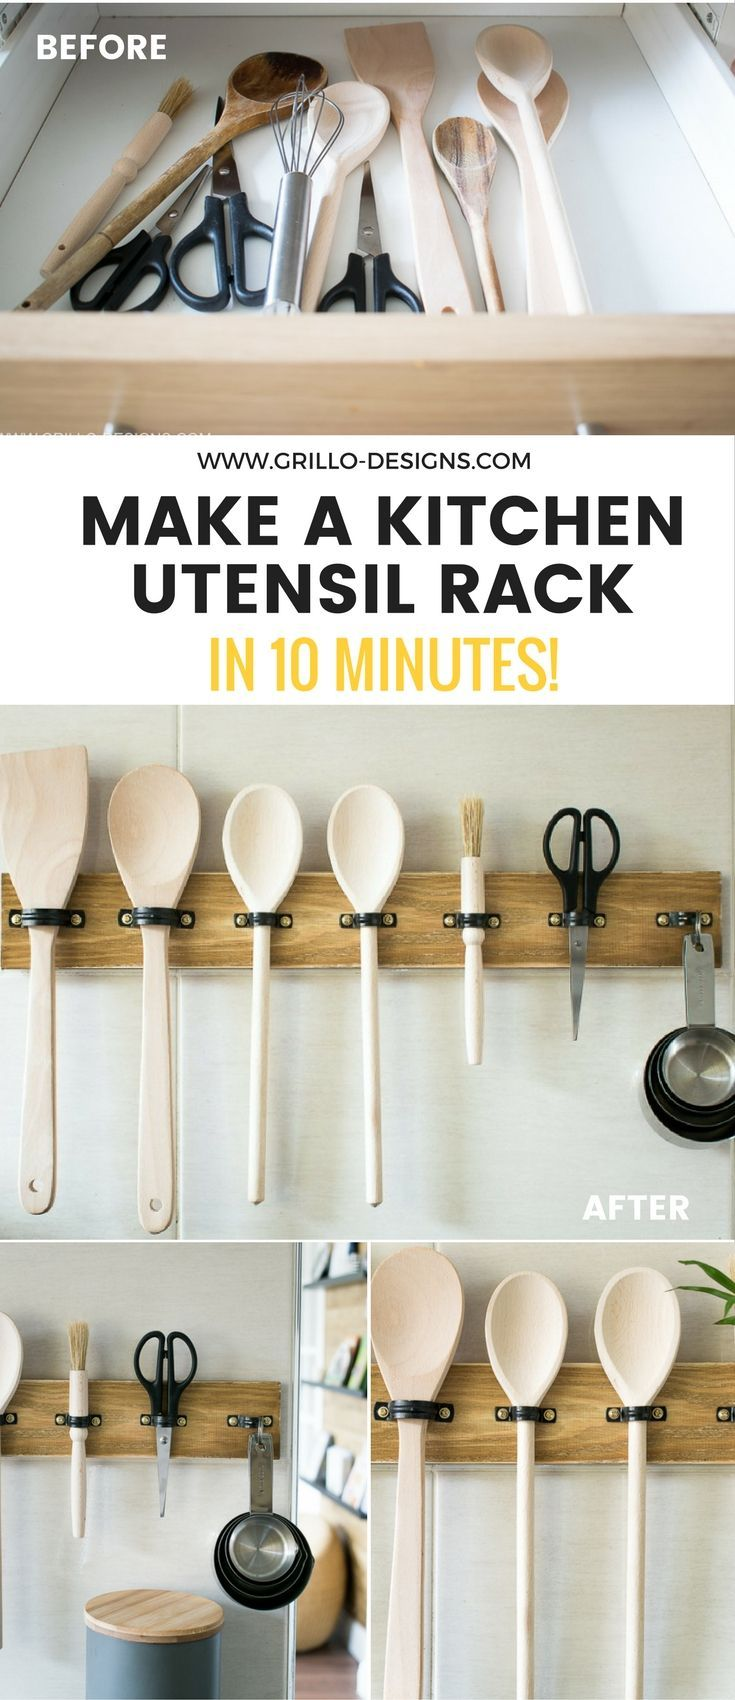 Make a DIY Utensil Hanging Rack - In 10 mins!   Pinterest   Diy ...